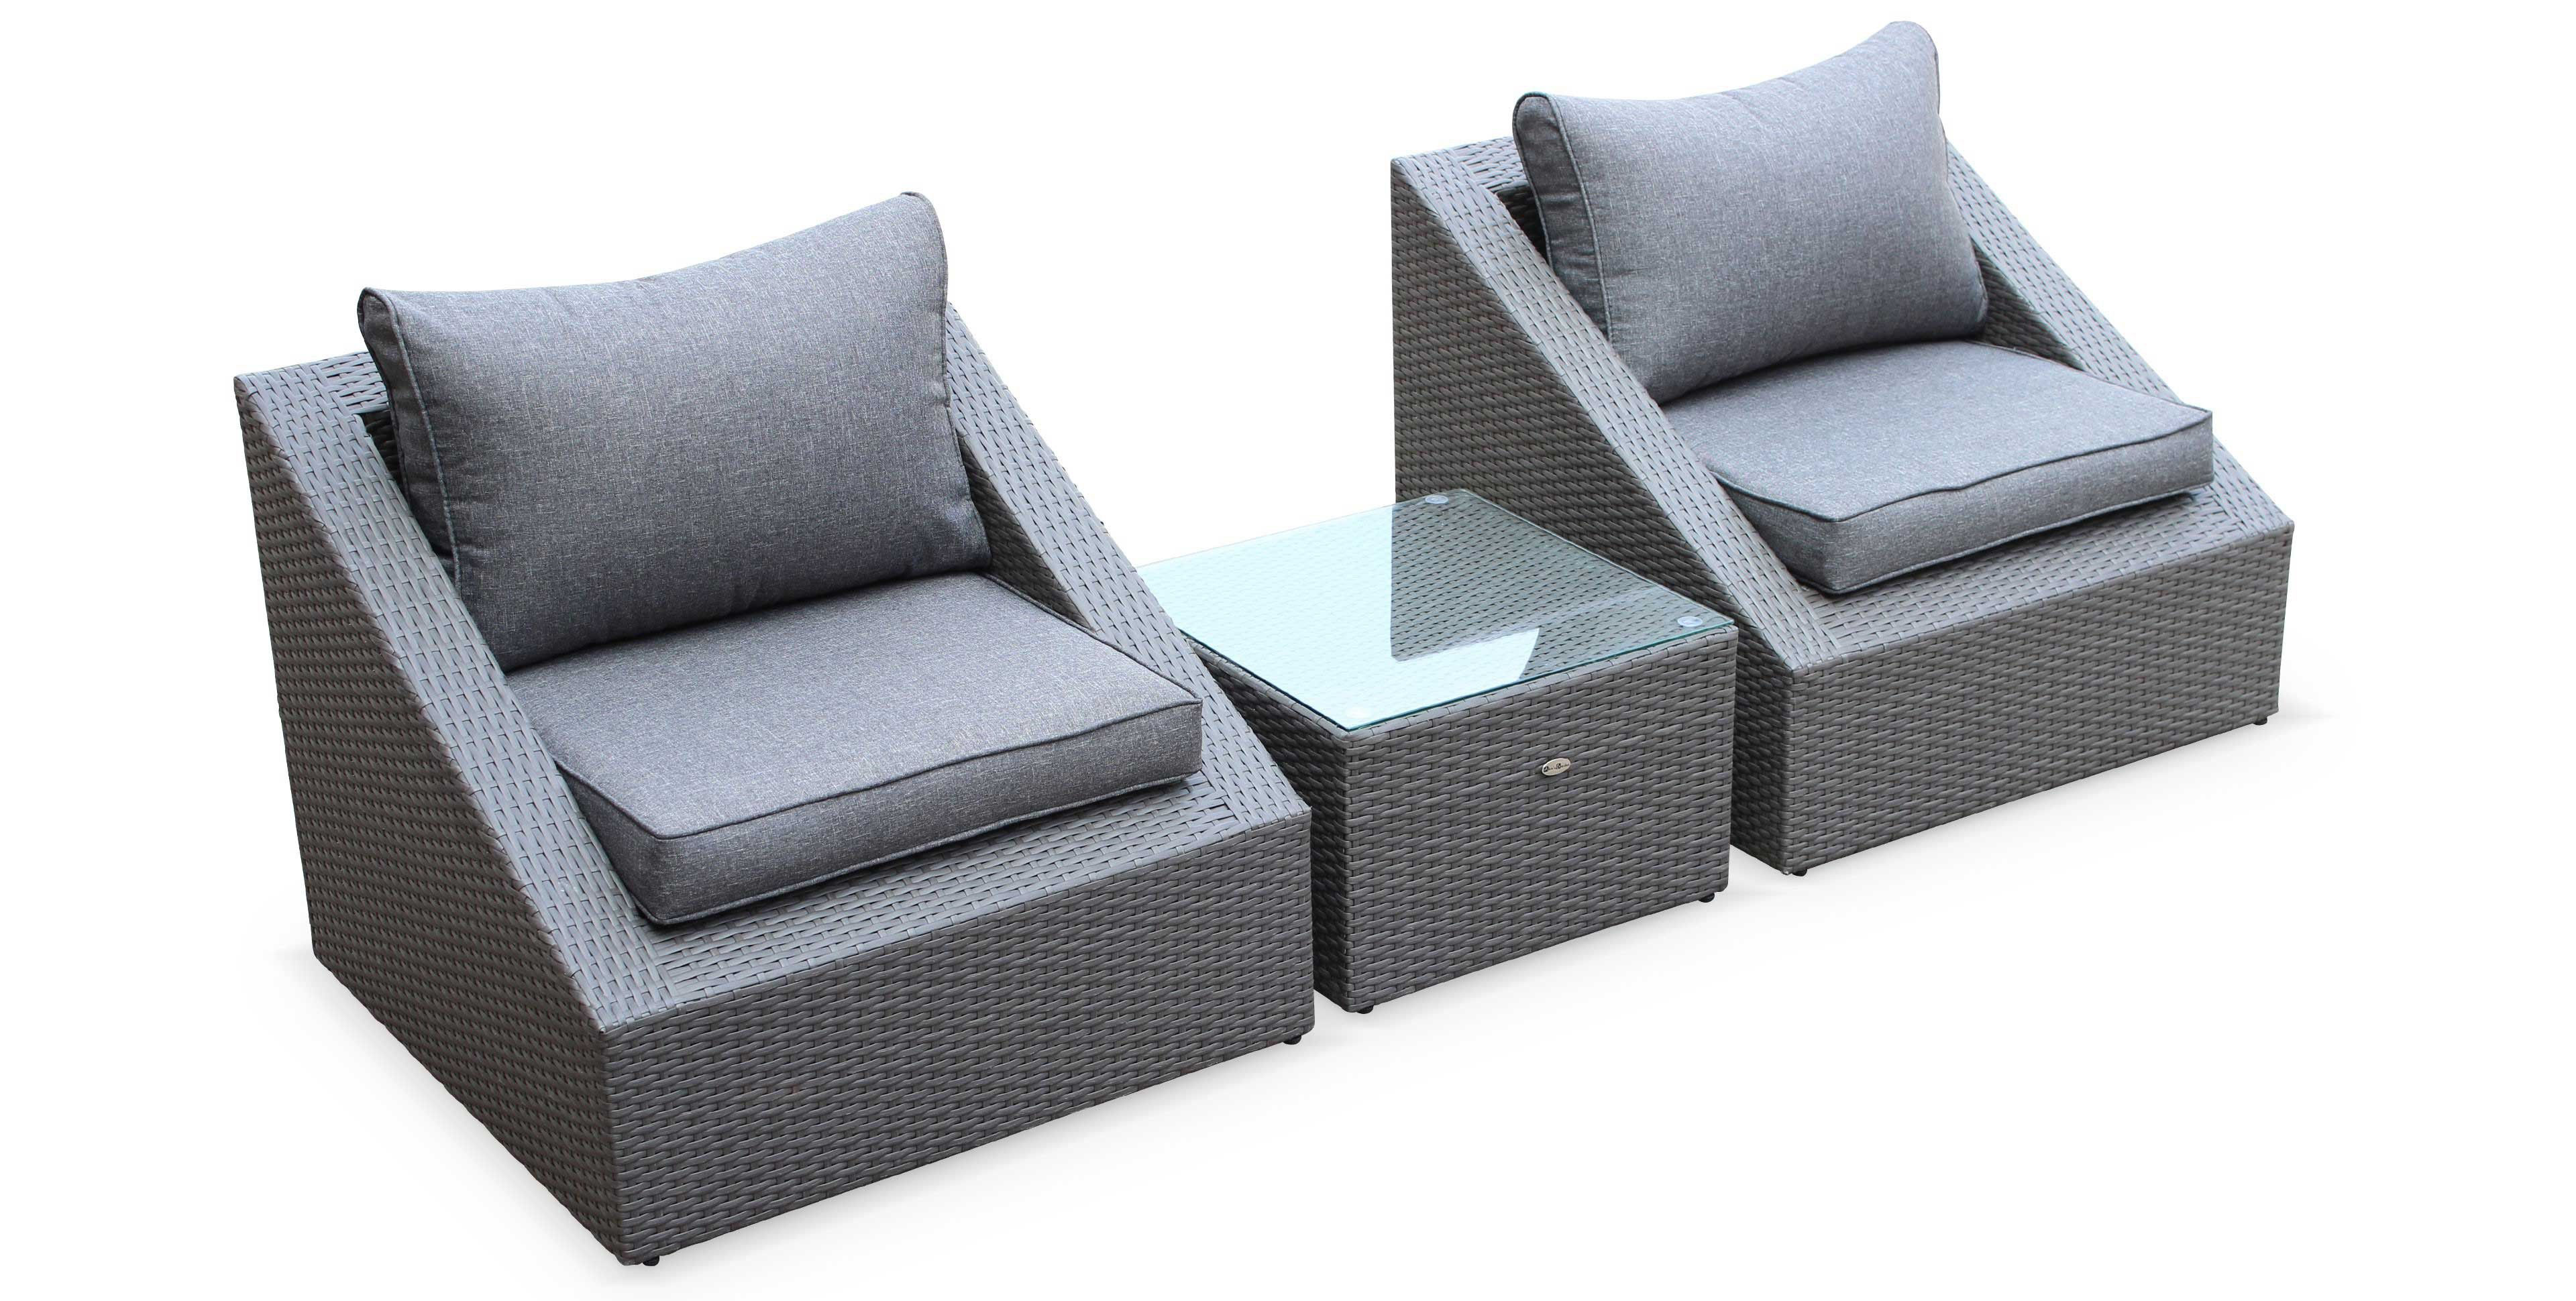 awesome salon de jardin resine table basse pictures amazing design ideas. Black Bedroom Furniture Sets. Home Design Ideas